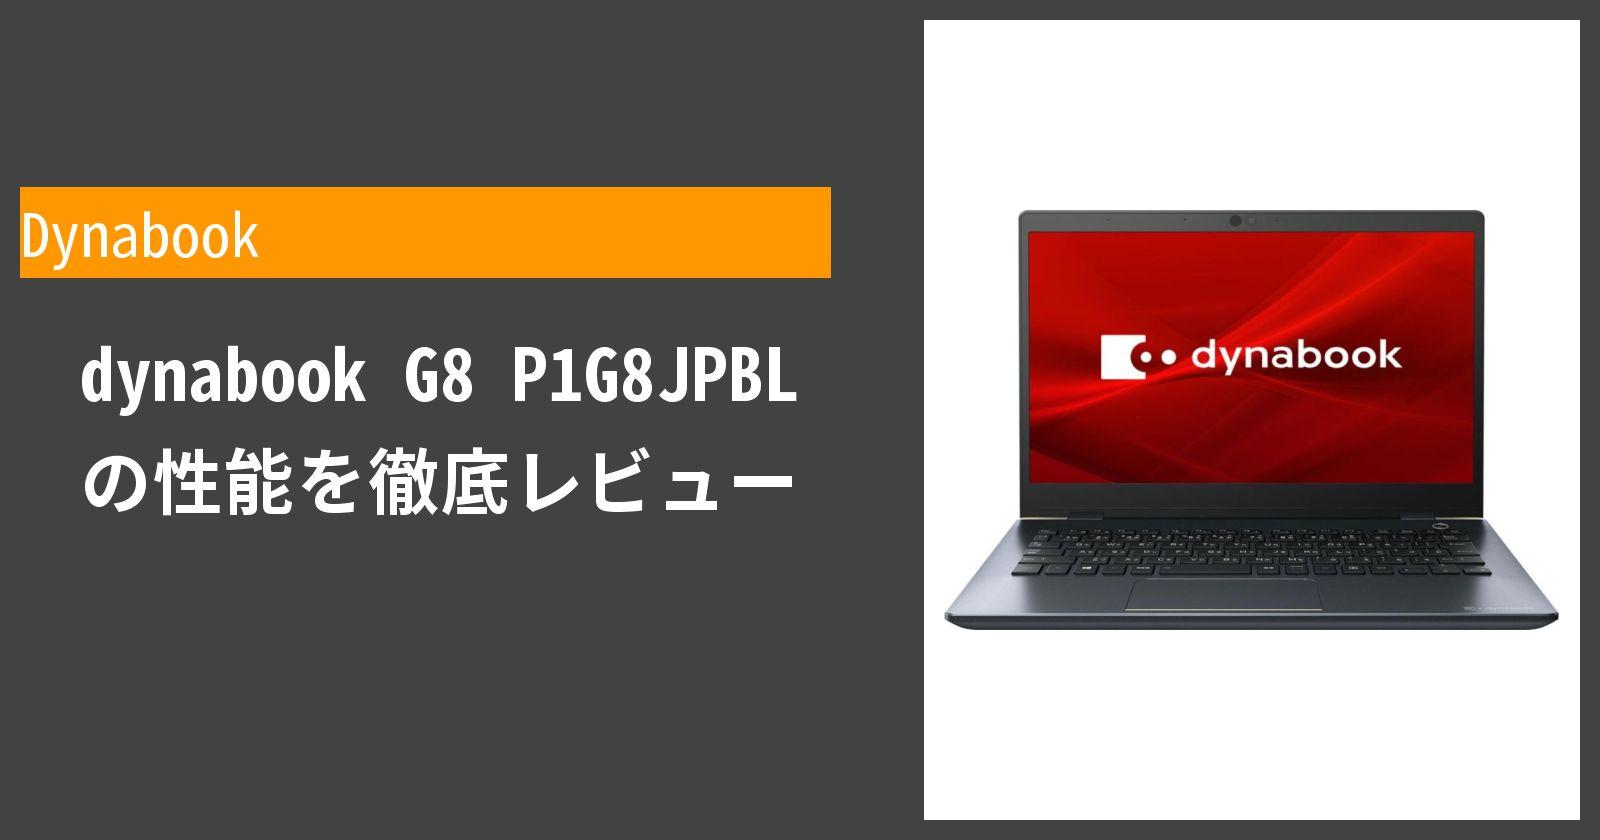 dynabook G8 P1G8JPBL の性能を徹底レビュー